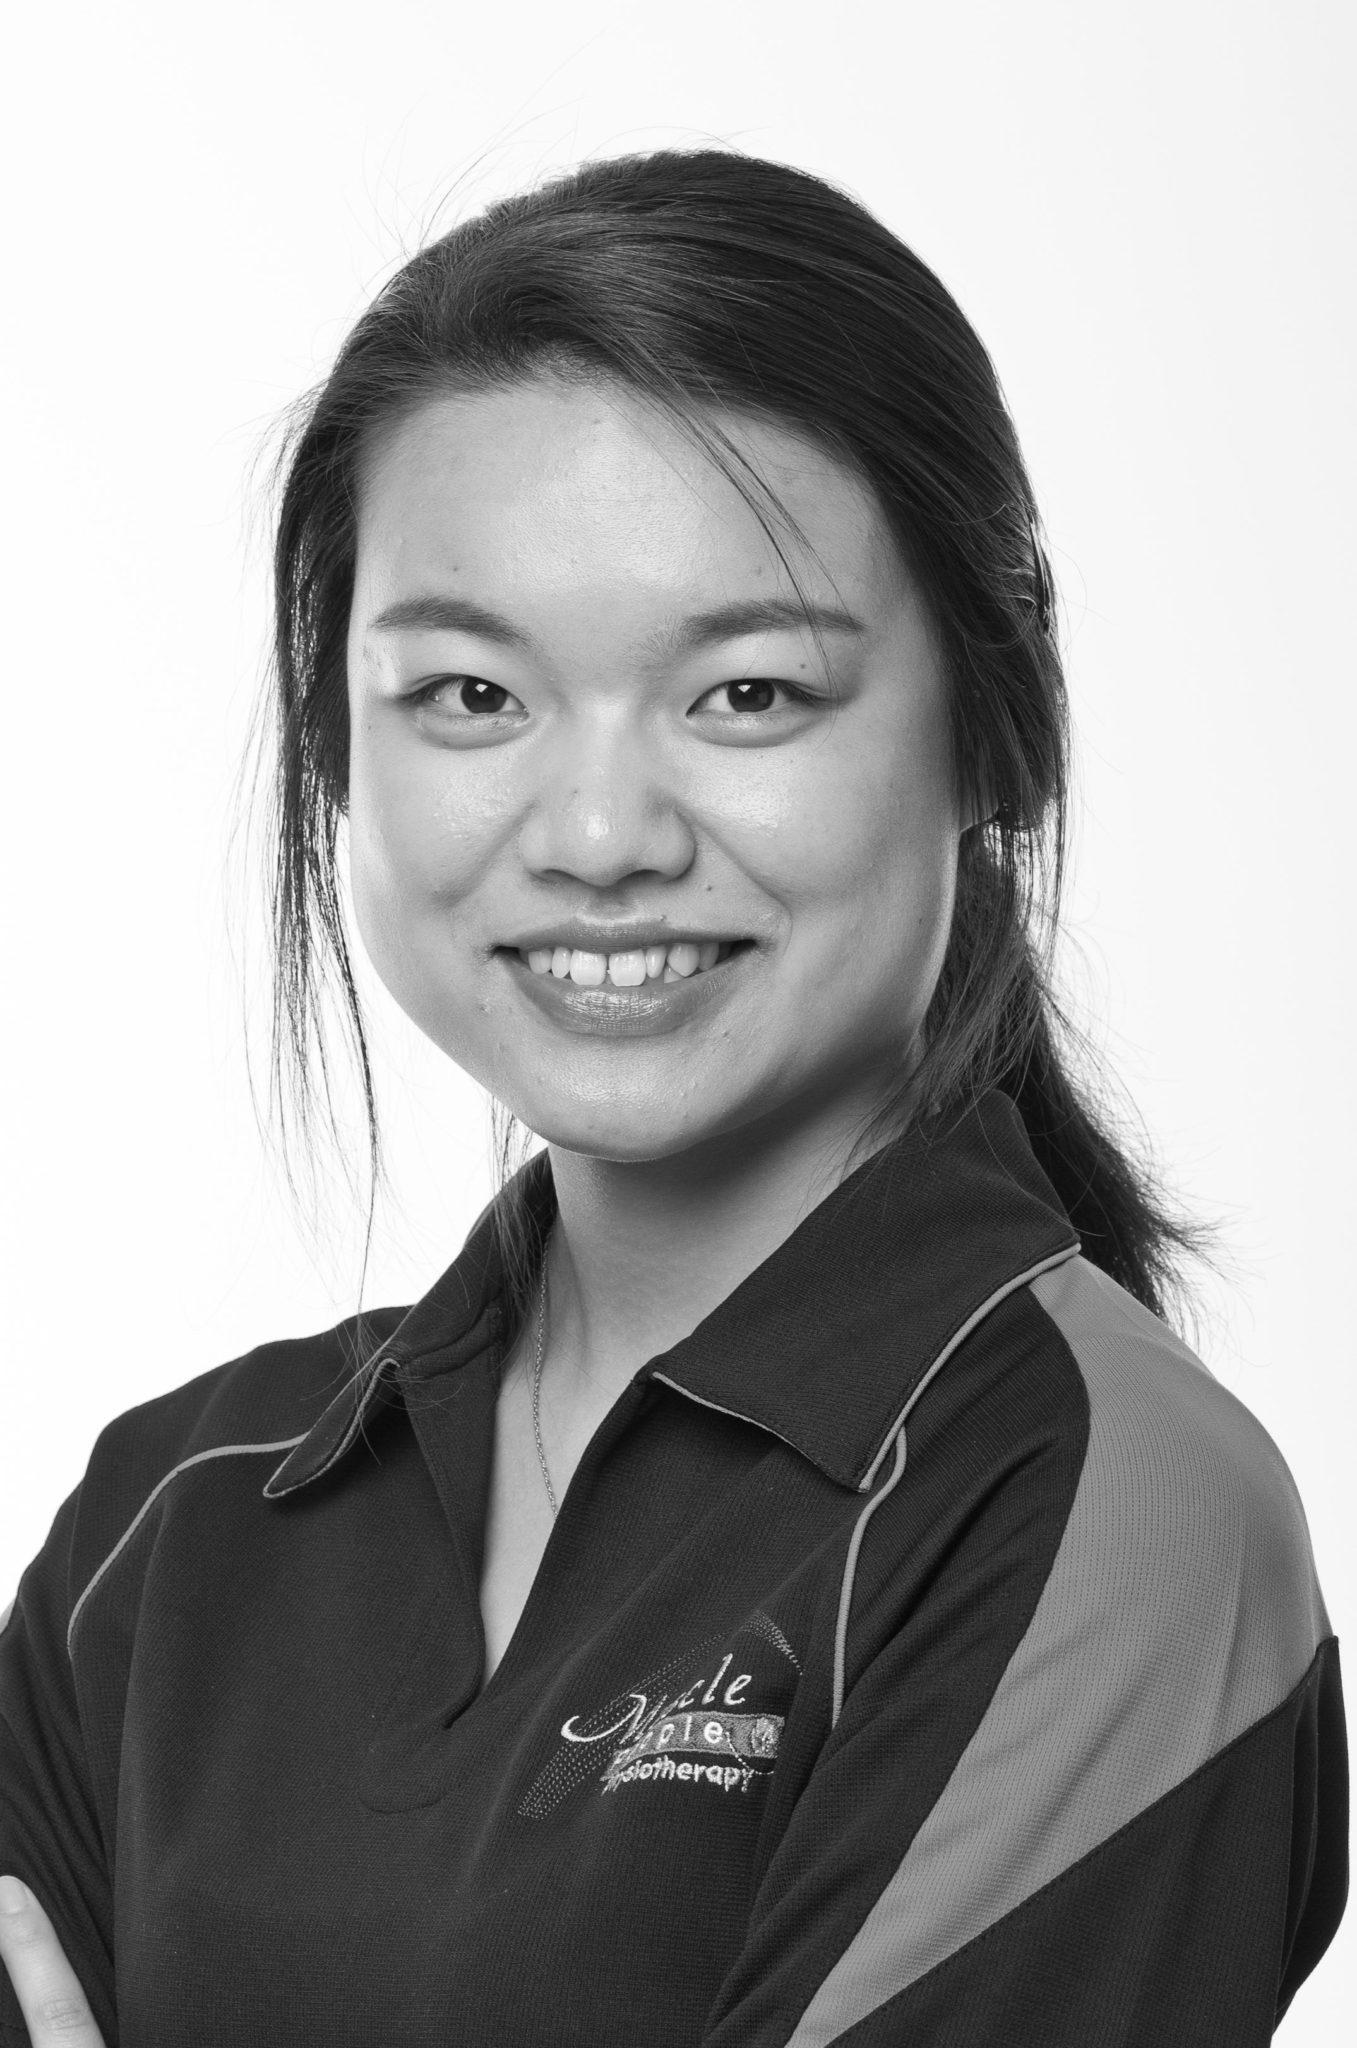 Diana Chen